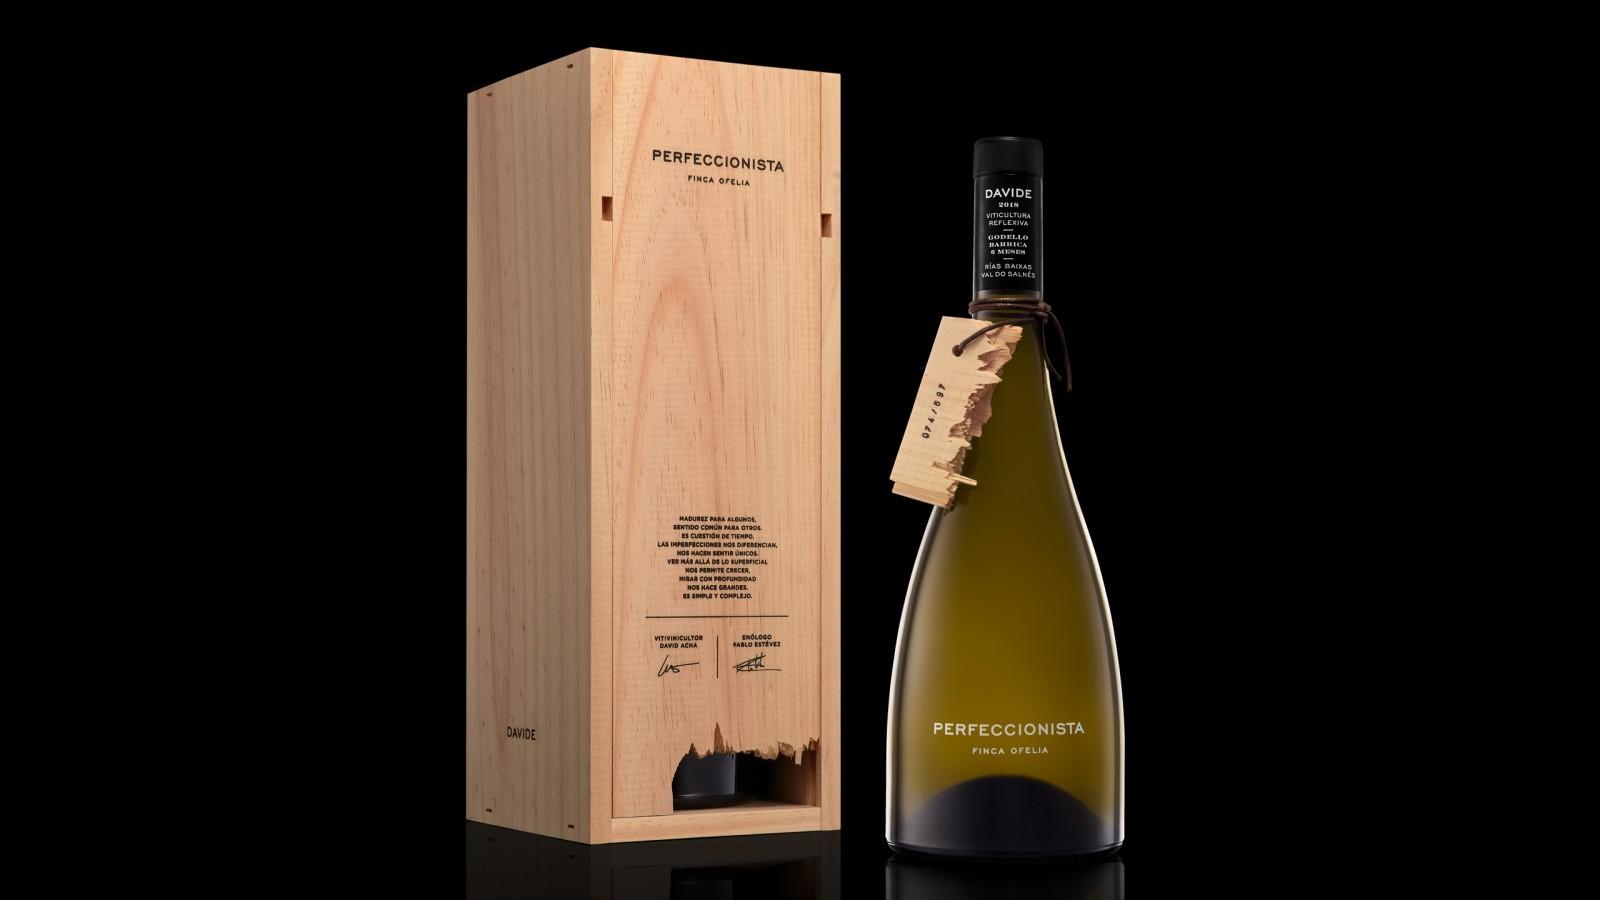 Roberto Núñez Studio Creates Packaging Design for Perfeccionista Limited Edition Premium Wine